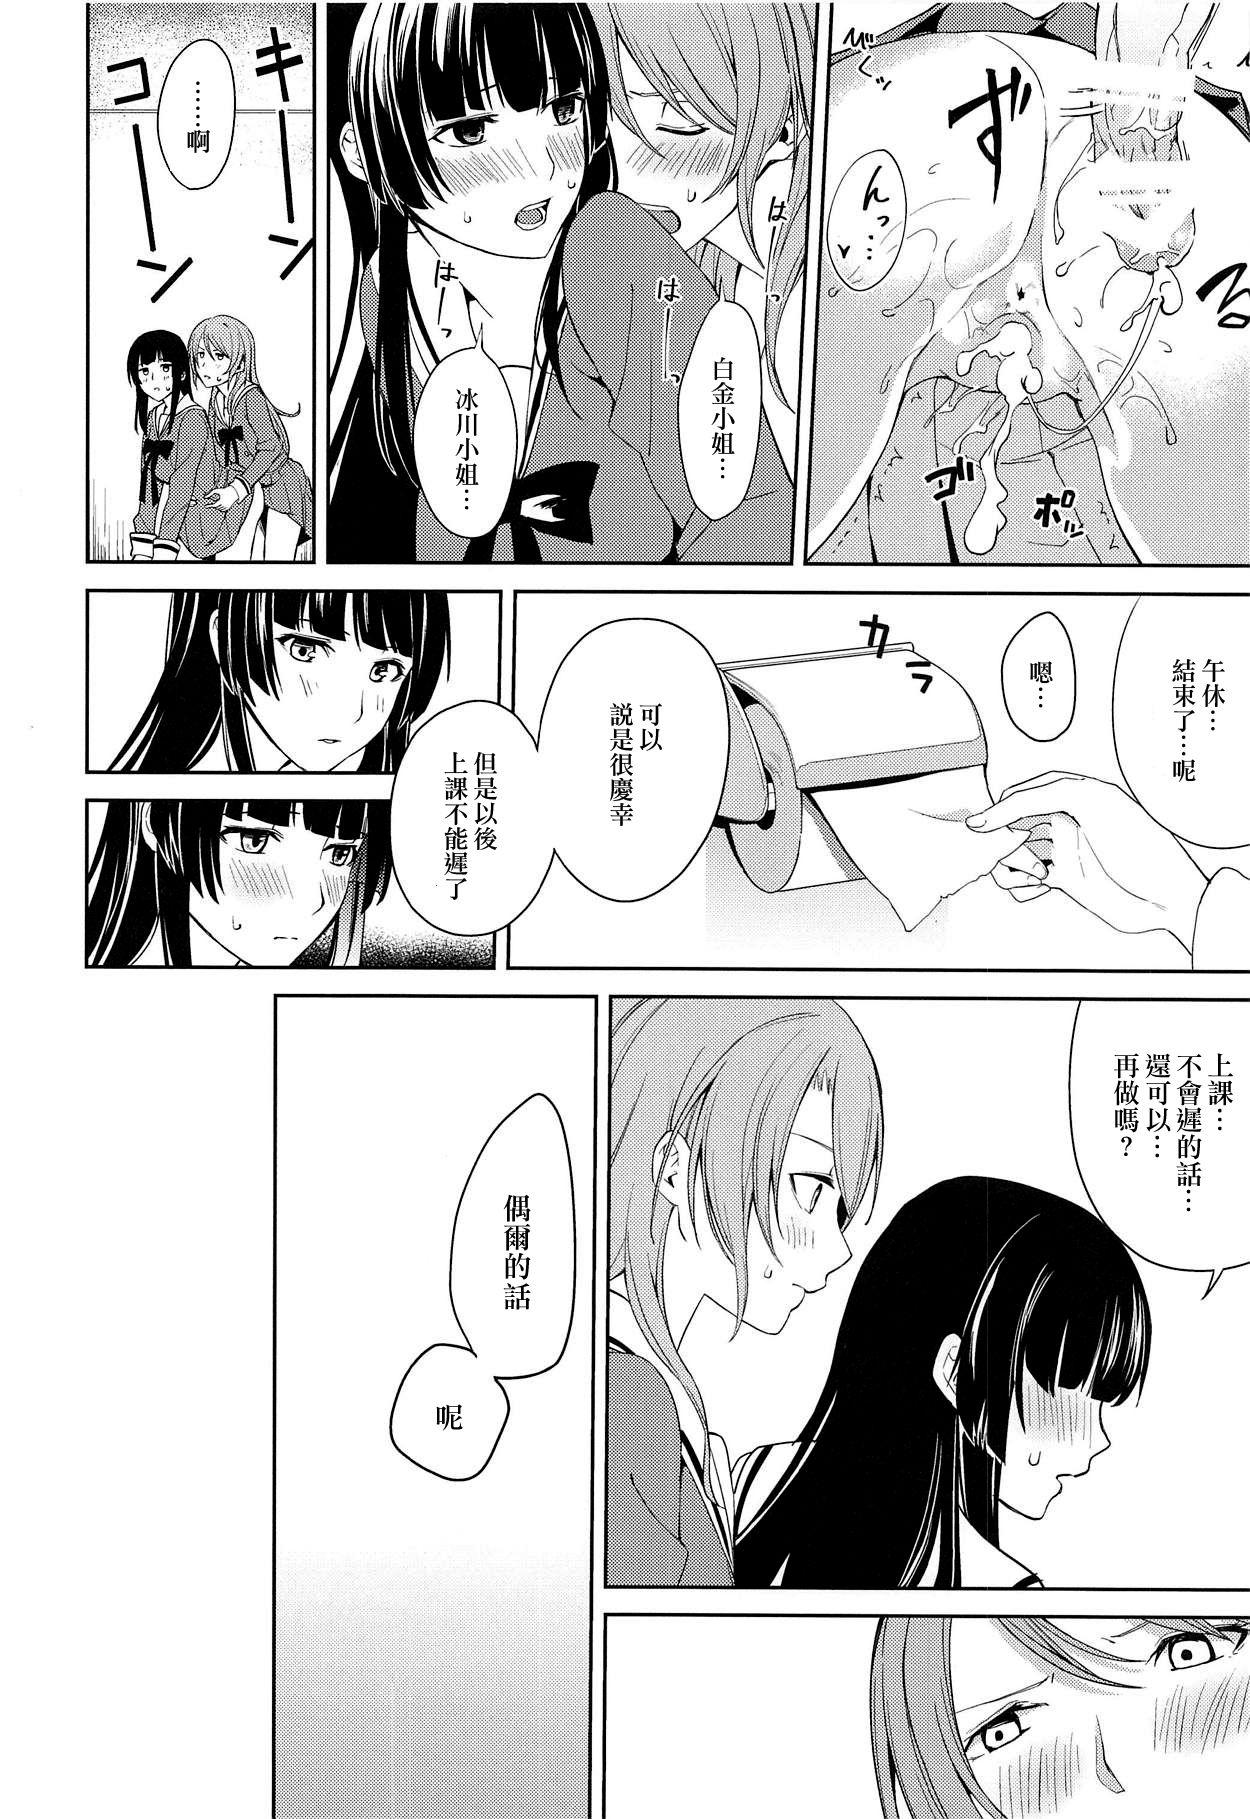 RinSayo Futanari Ecchi Bon   燐子紗夜扶她H本 18